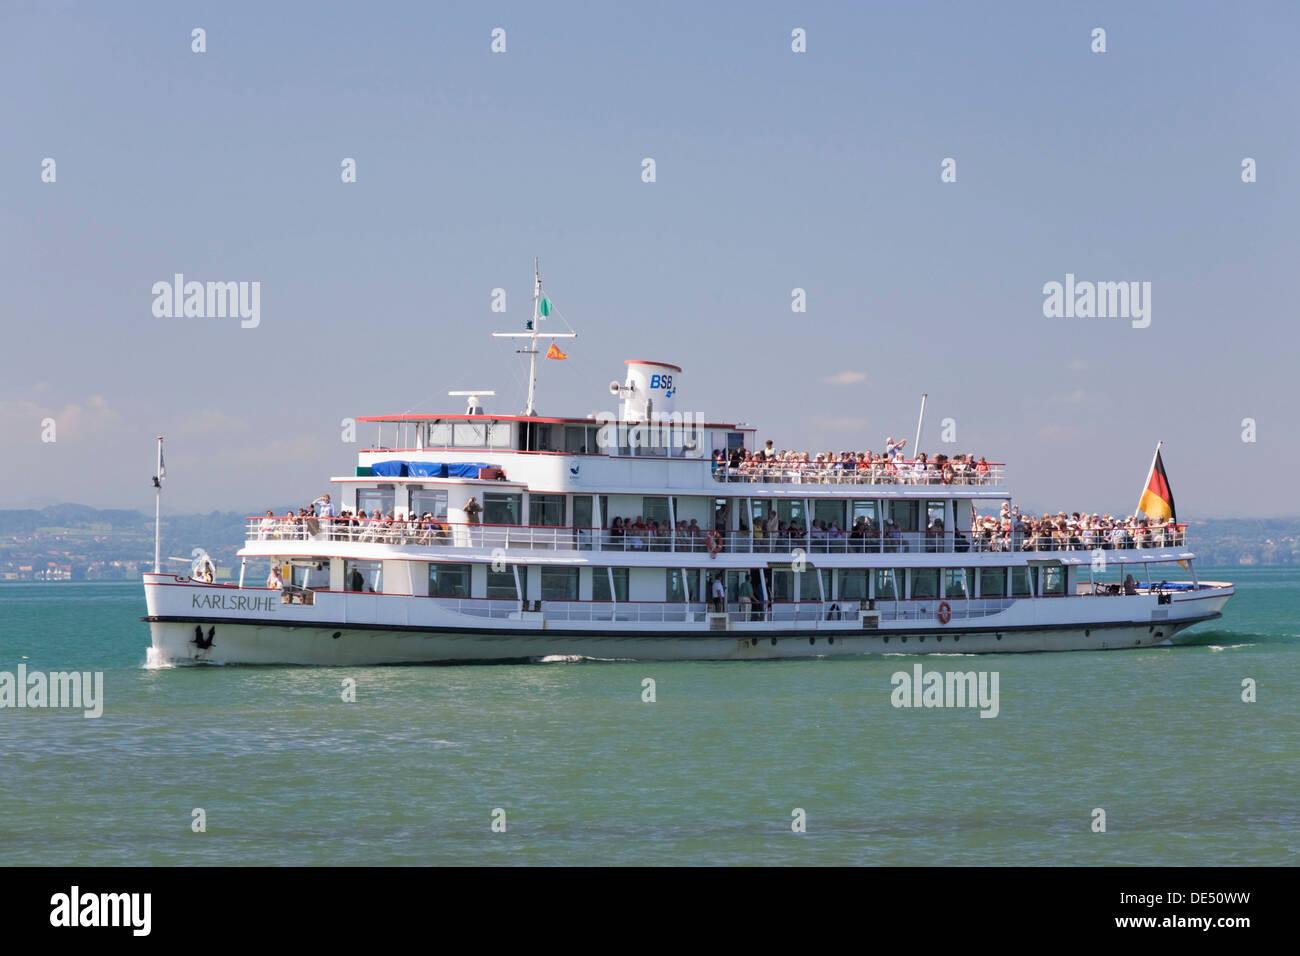 Passenger ferry cruising on Lake Constance, Baden-Wuerttemberg - Stock Image